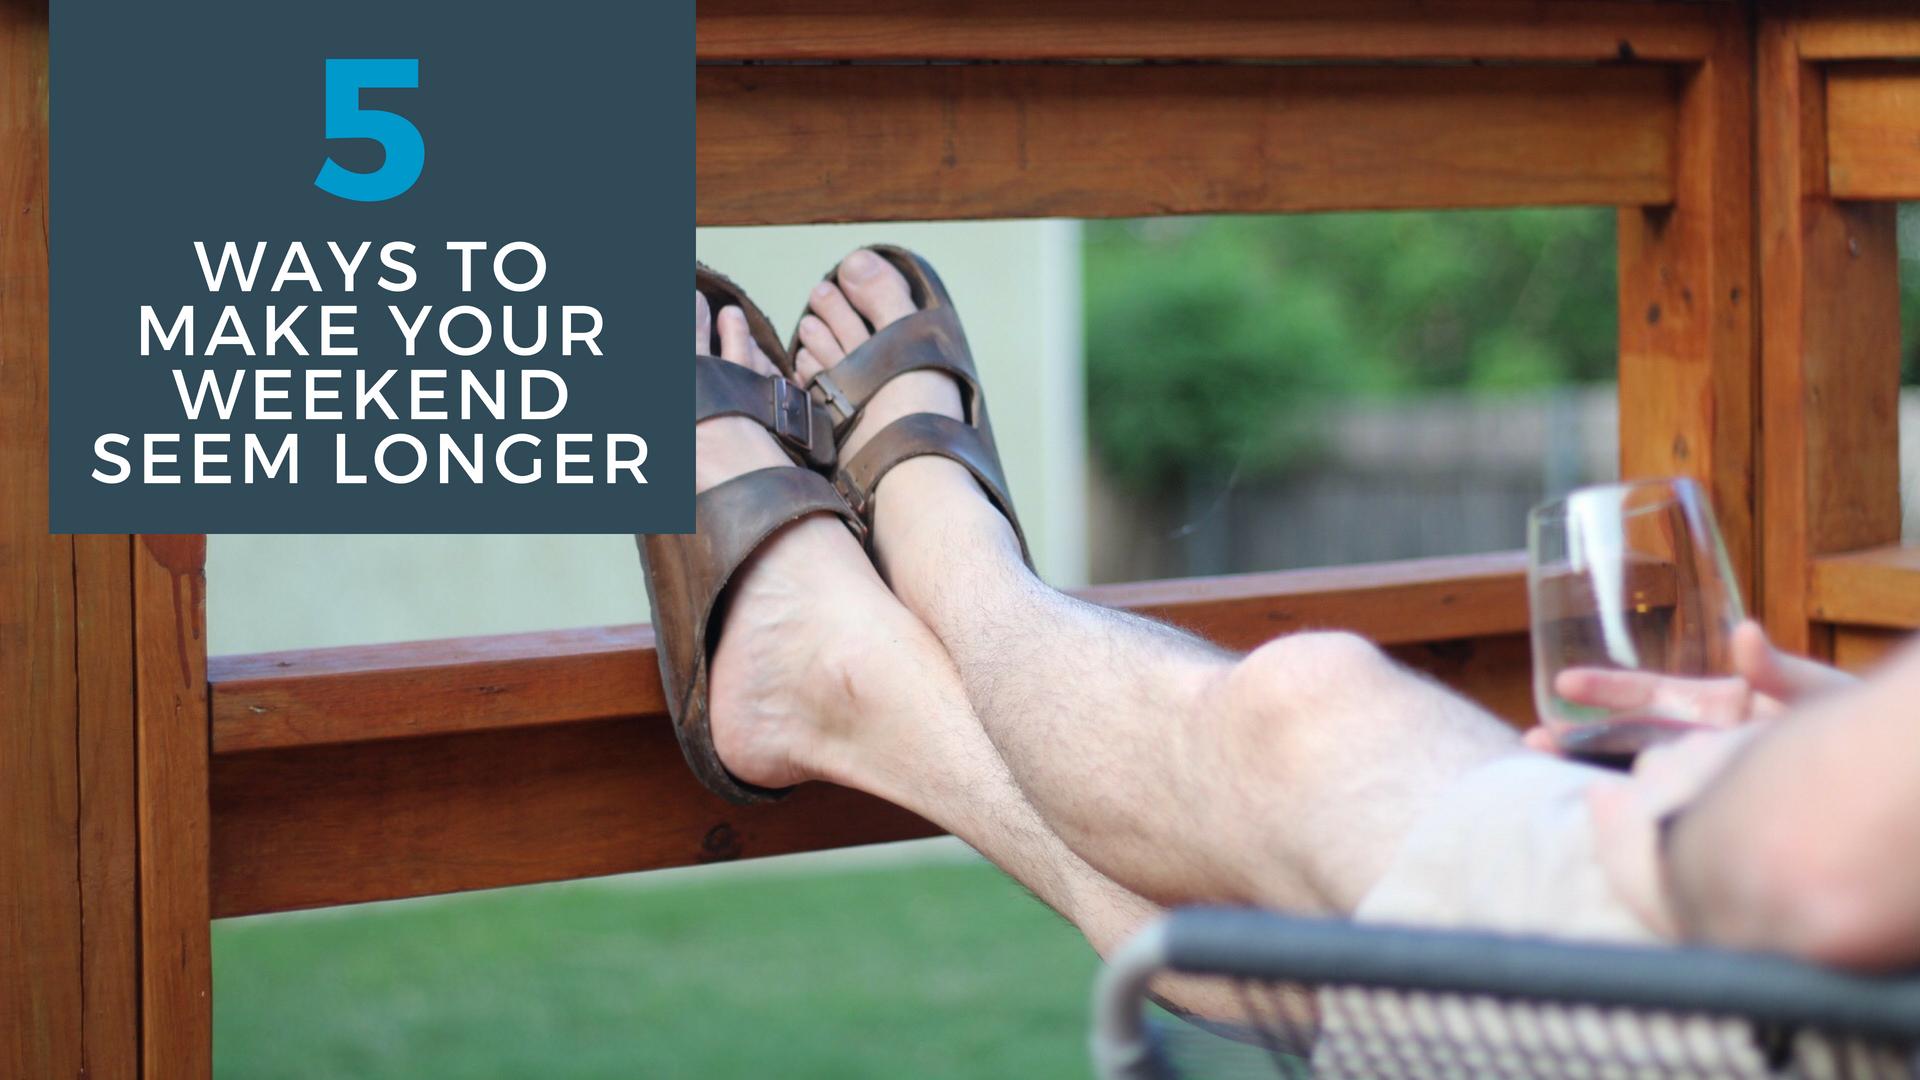 5 ways to make your weekend seem longer.jpg